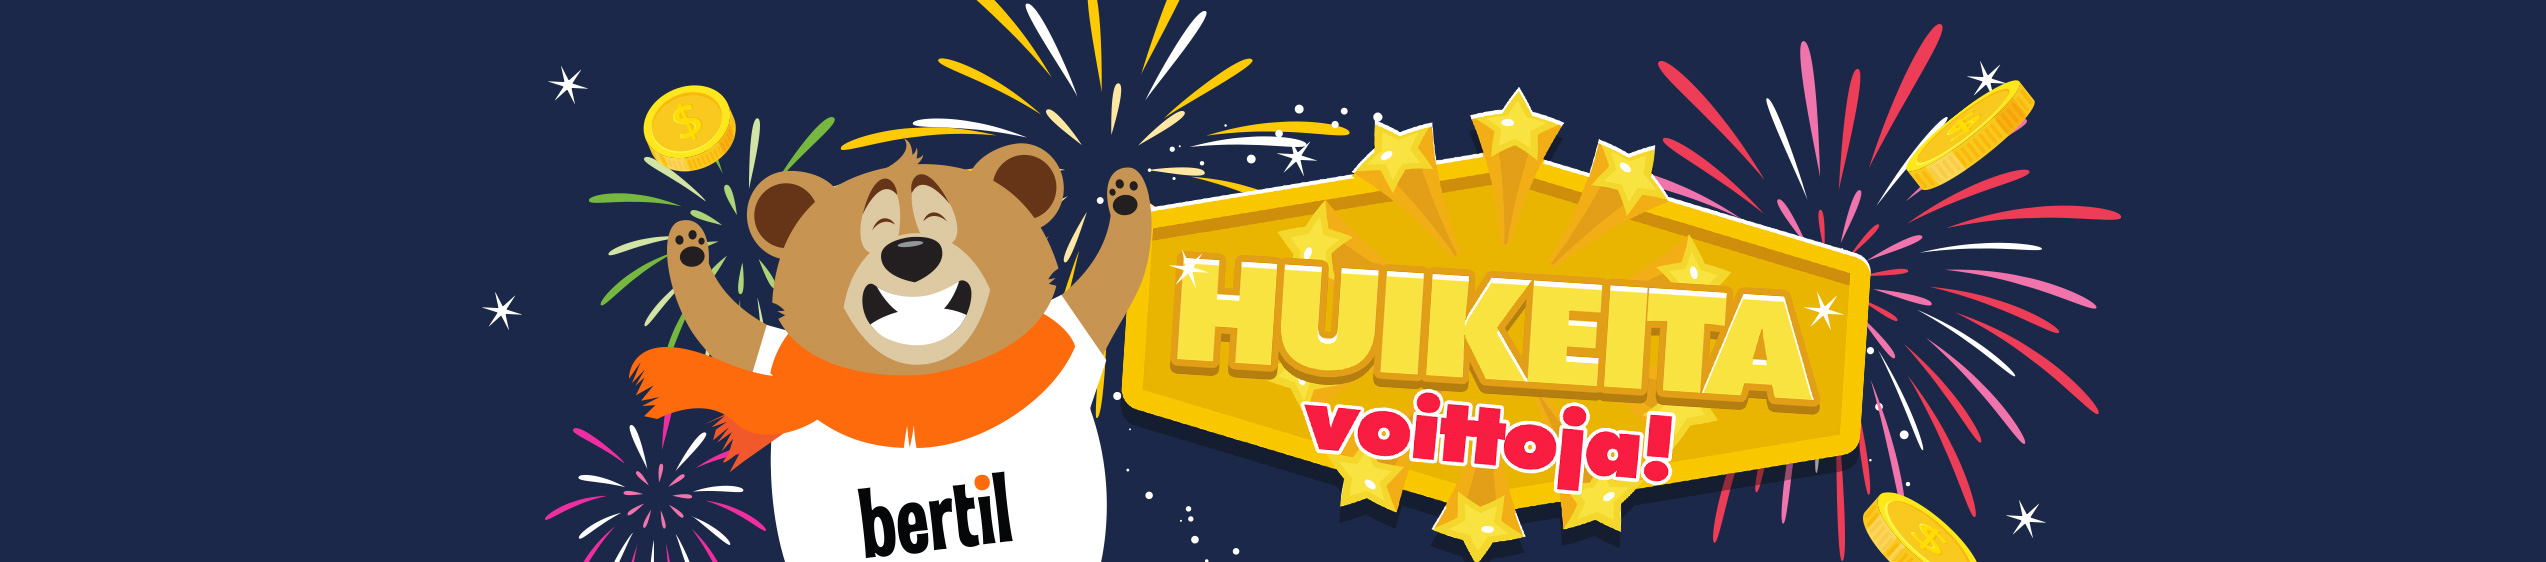 Voita 1000€ jackpotti Sade-bingossa perjantai ja sunnuntaina!